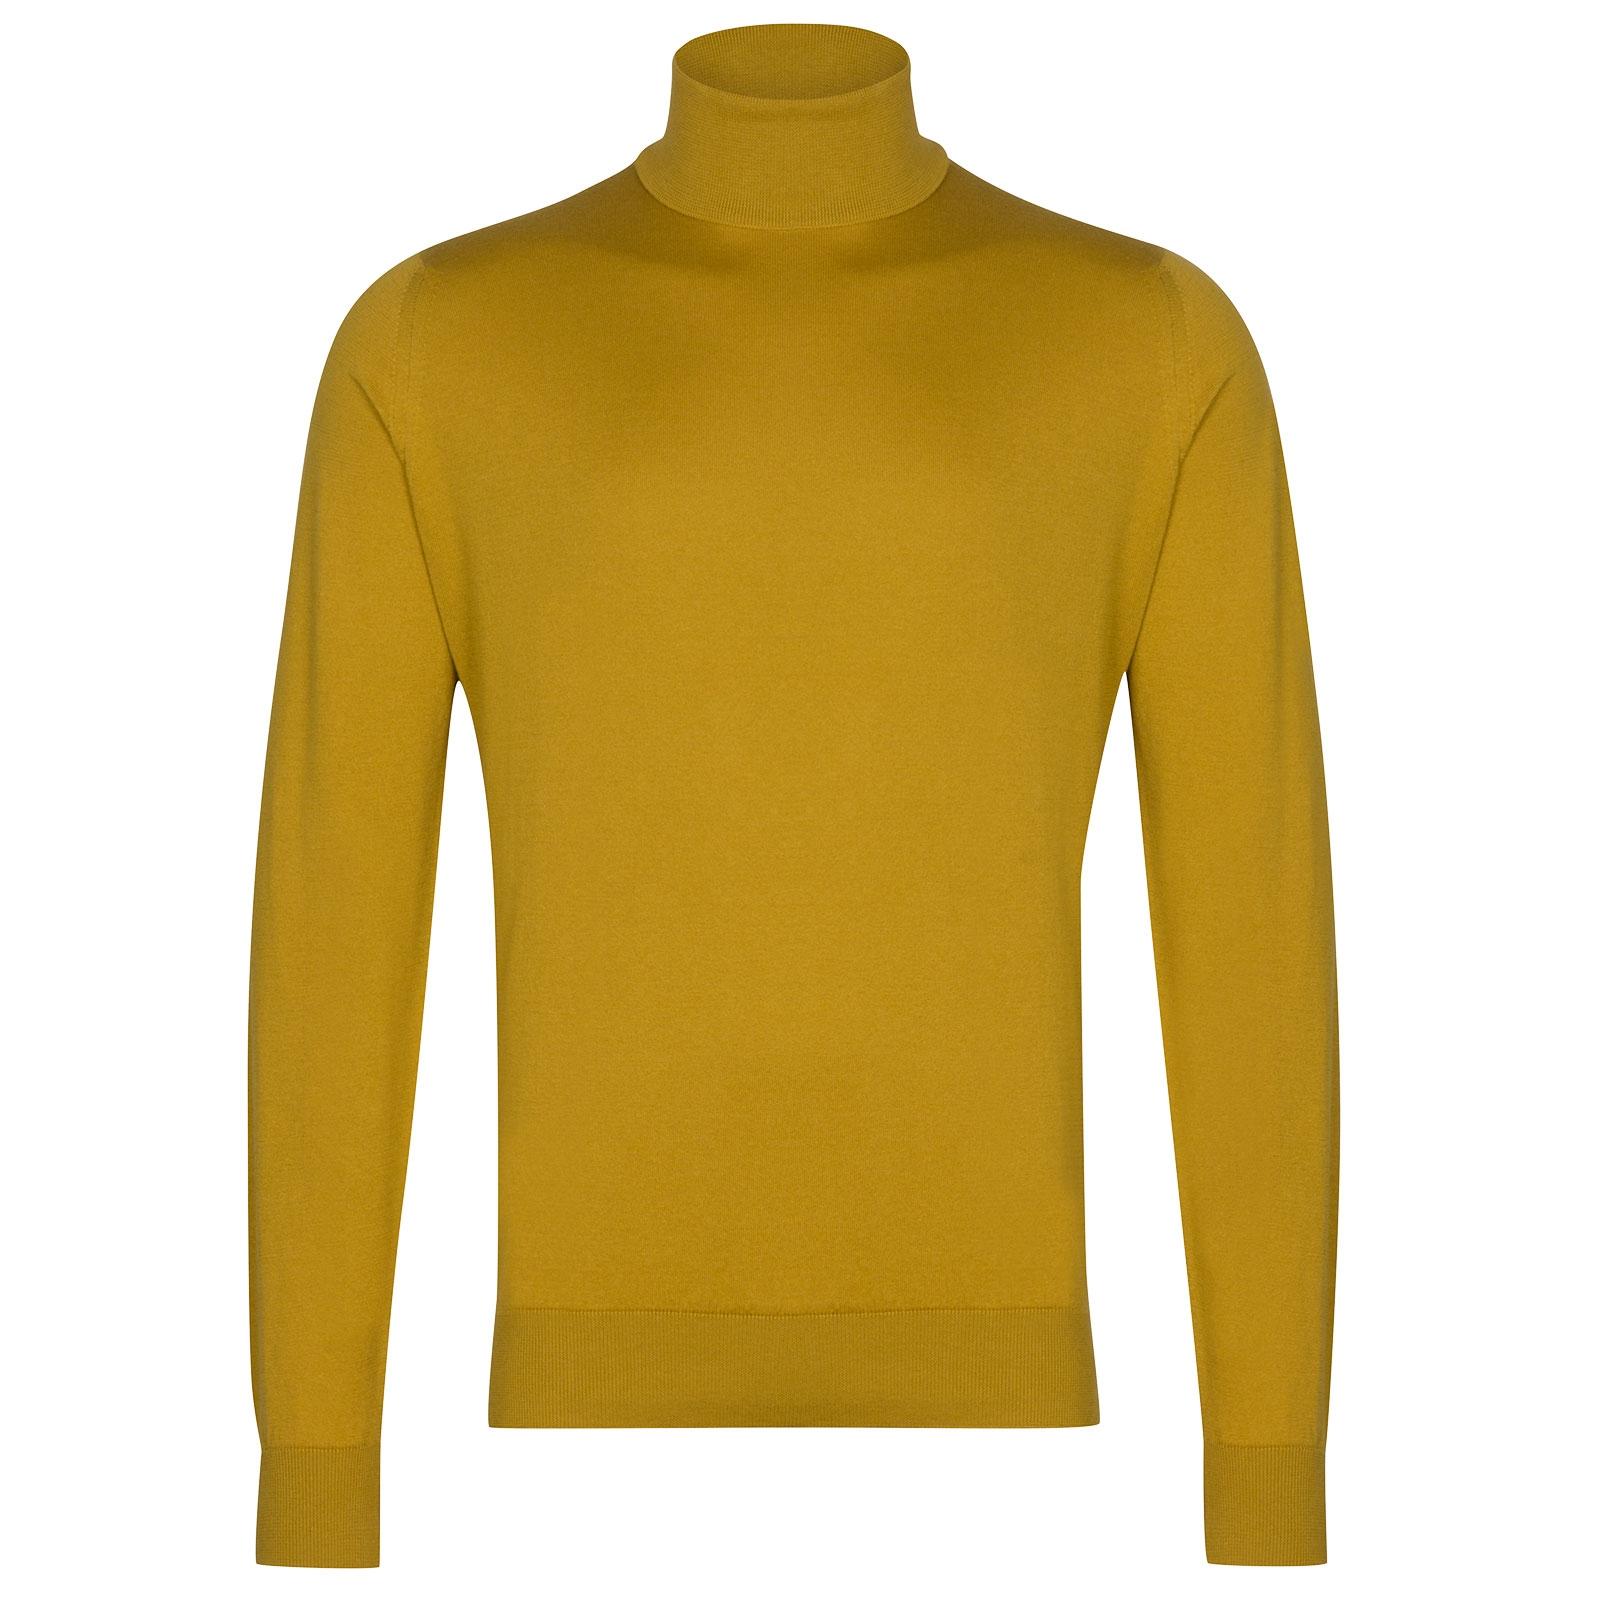 John Smedley Hawley in Stamen Yellow Pullover-XXL